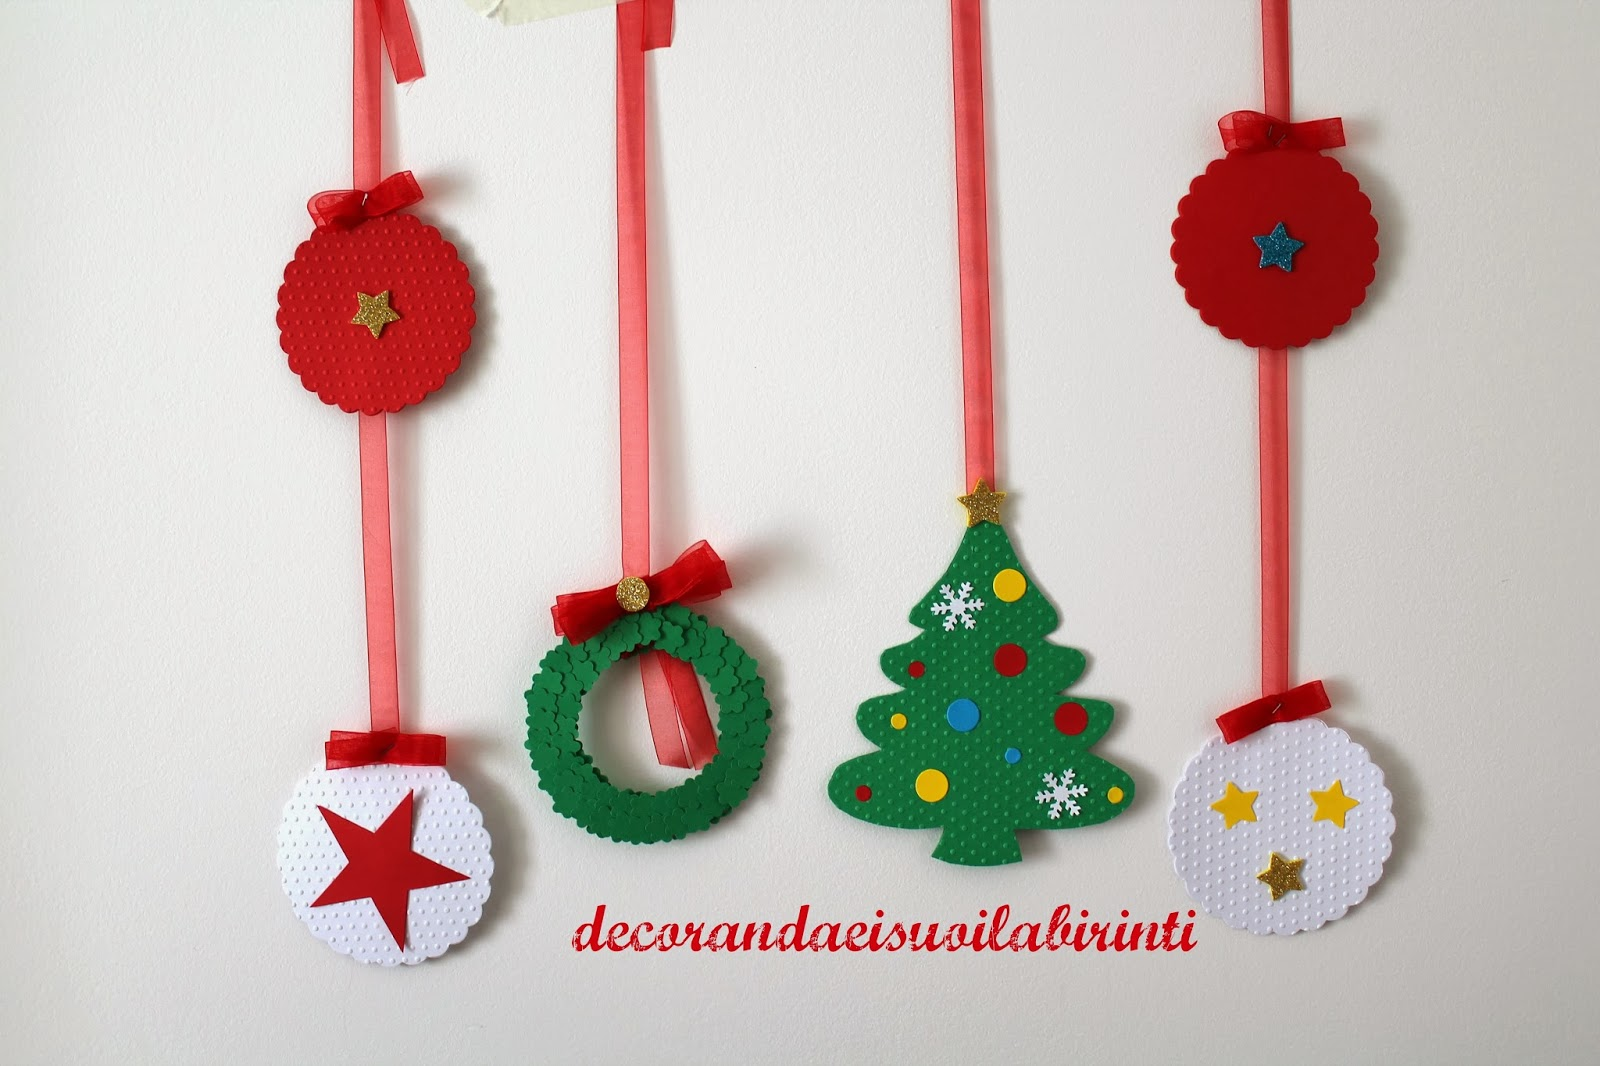 Decorandaeisuoilabirinti addobbi natalizi per aula for Addobbi autunnali per l aula